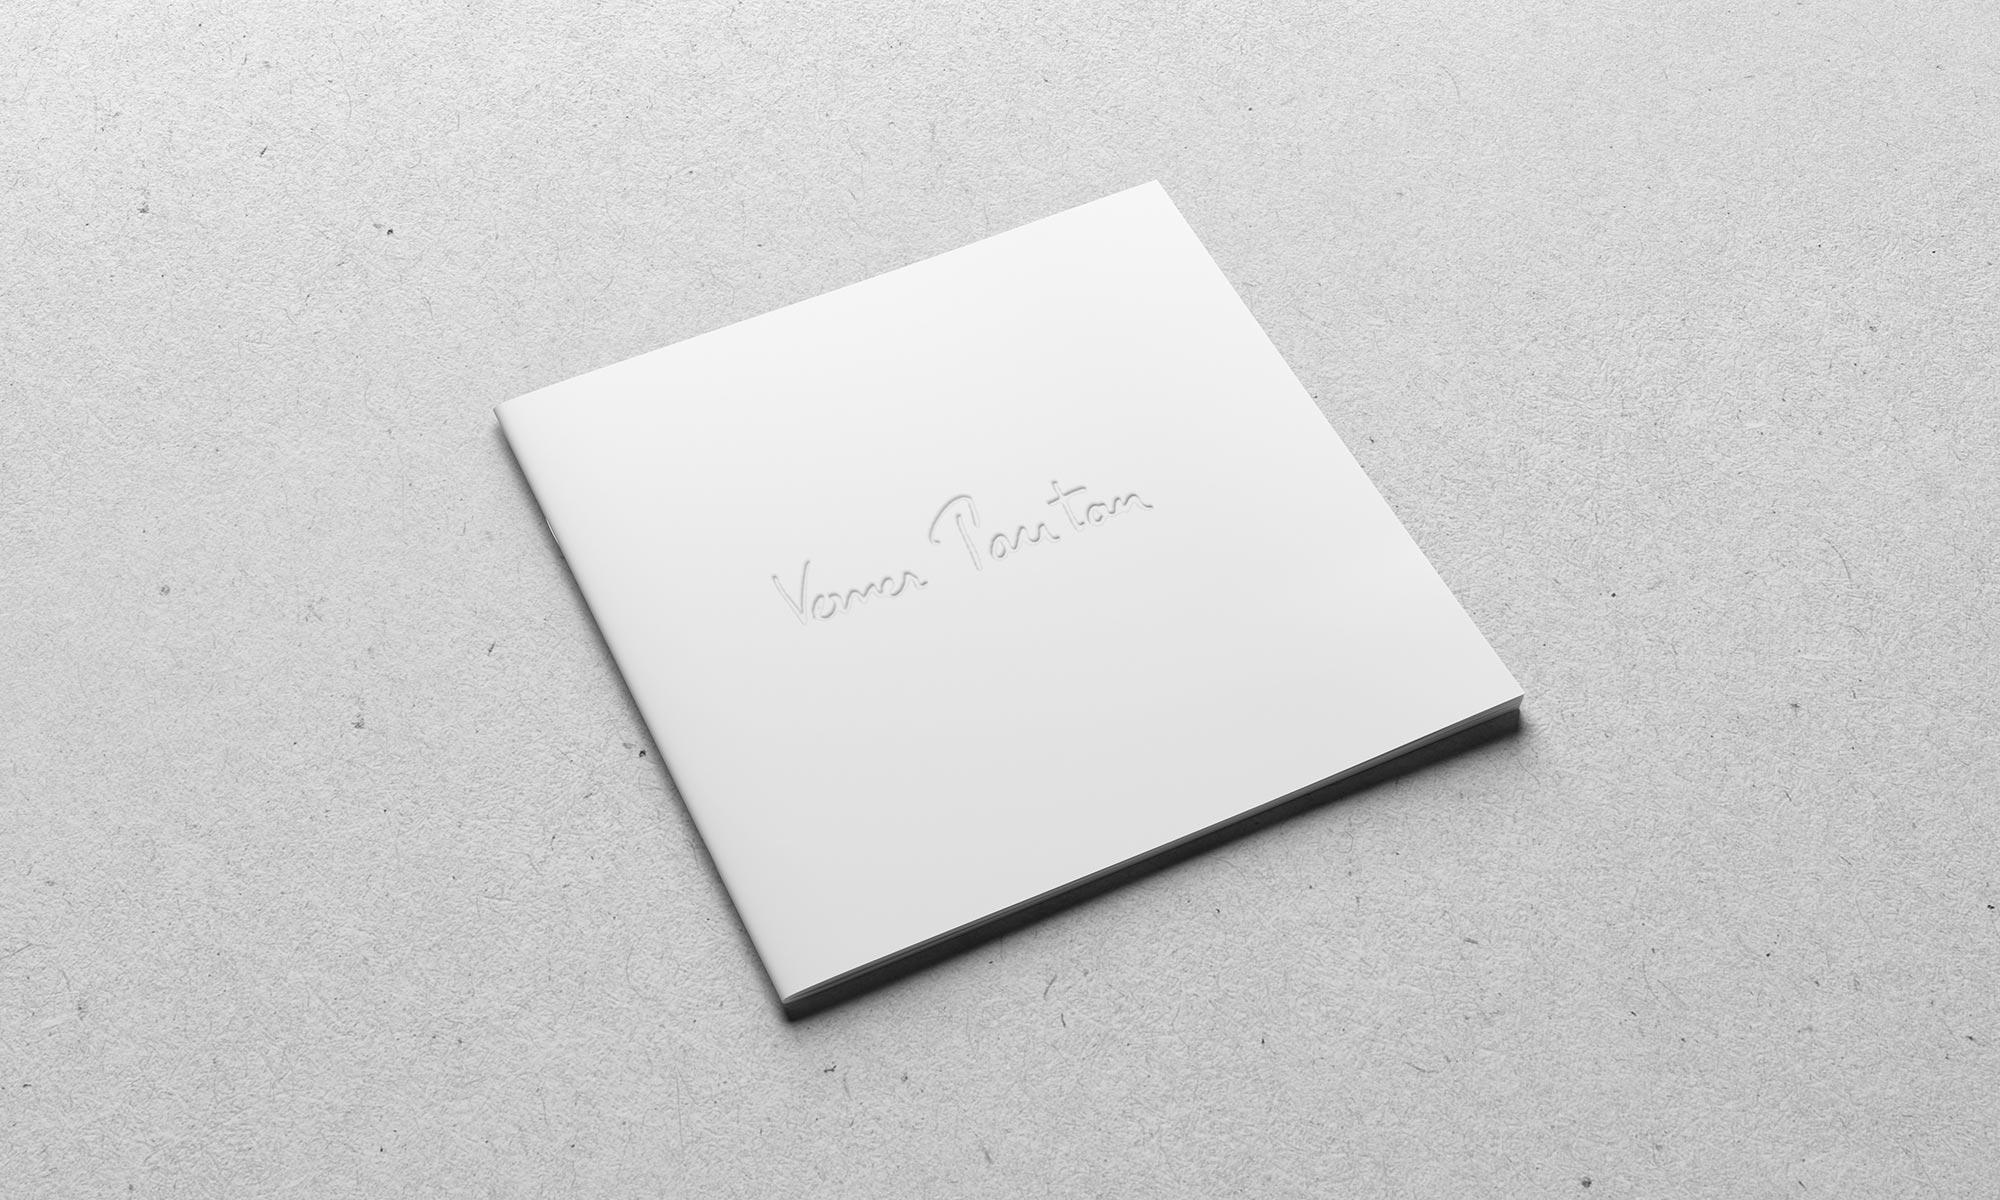 Möbeldesign Katalog Verner Panton Titel